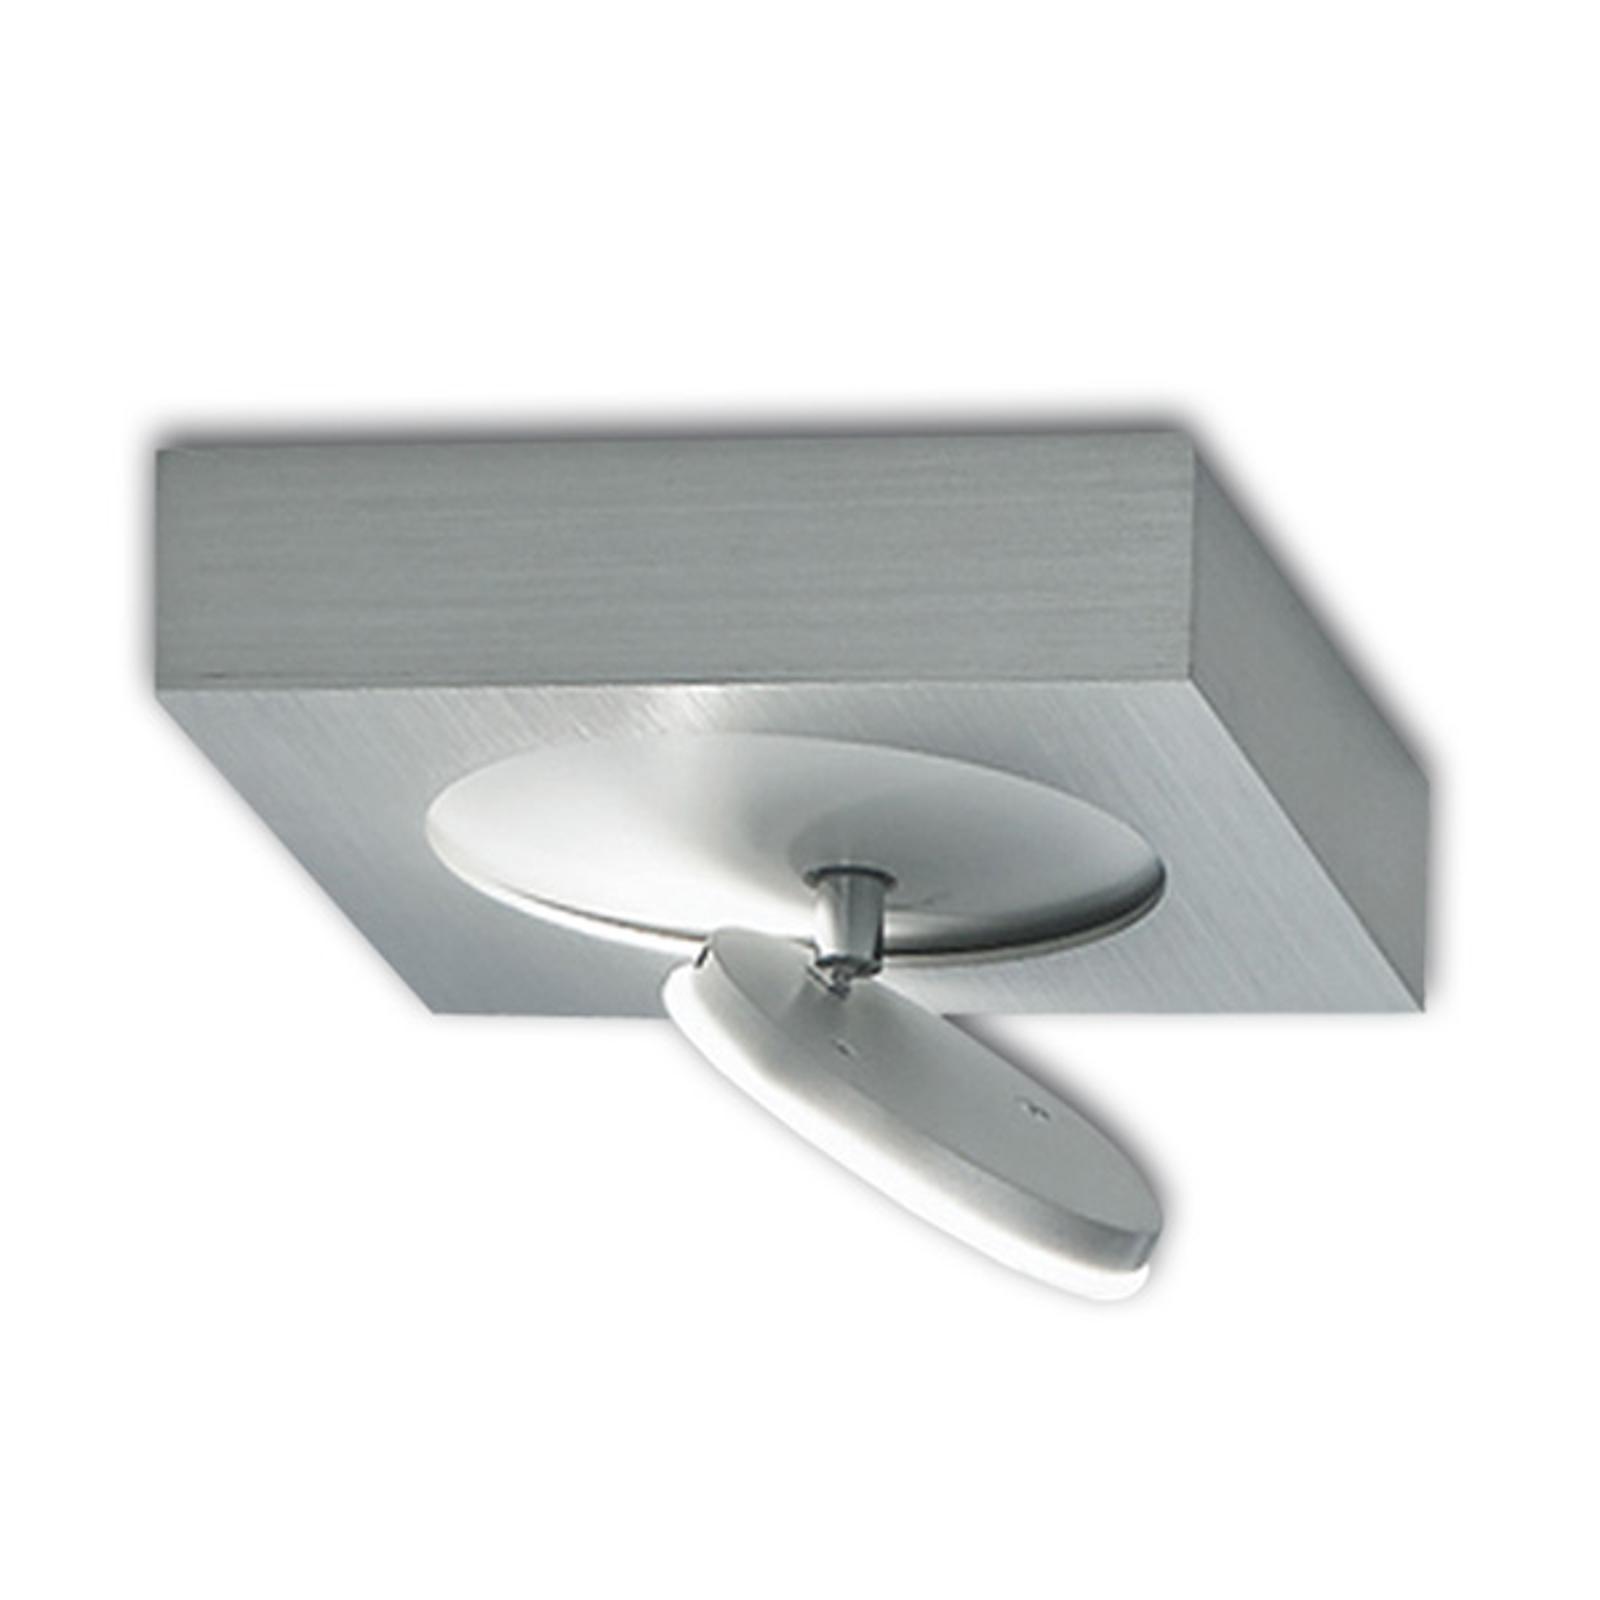 Plafondlamp Spot It met LED